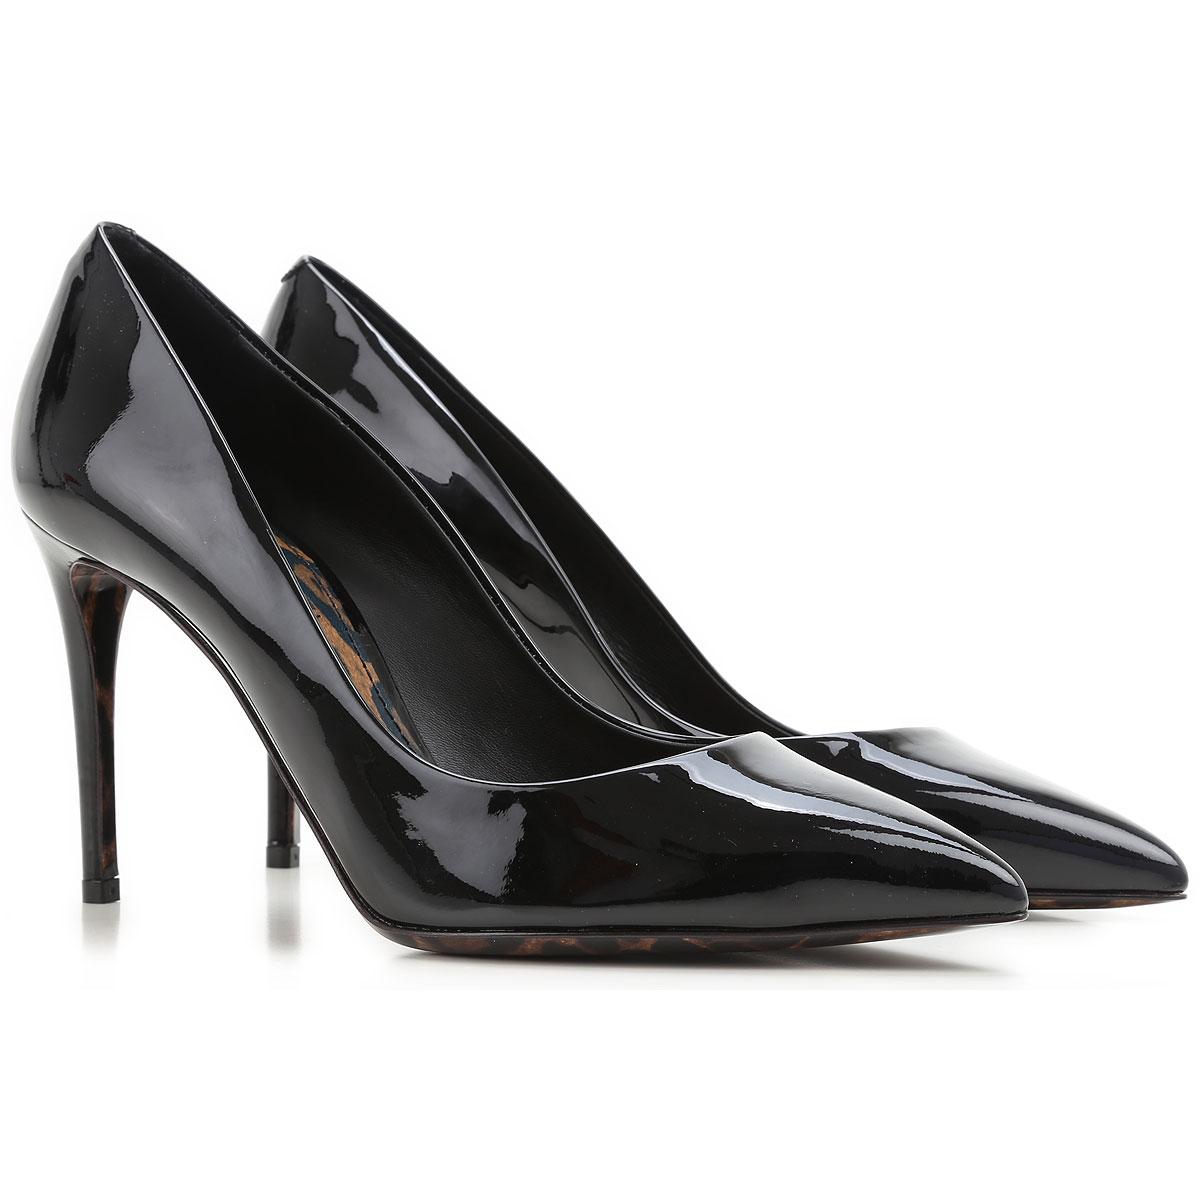 Dolce & Gabbana Pumps & High Heels moterims , juodi, Patent oda, 2019, 36 36.5 38.5